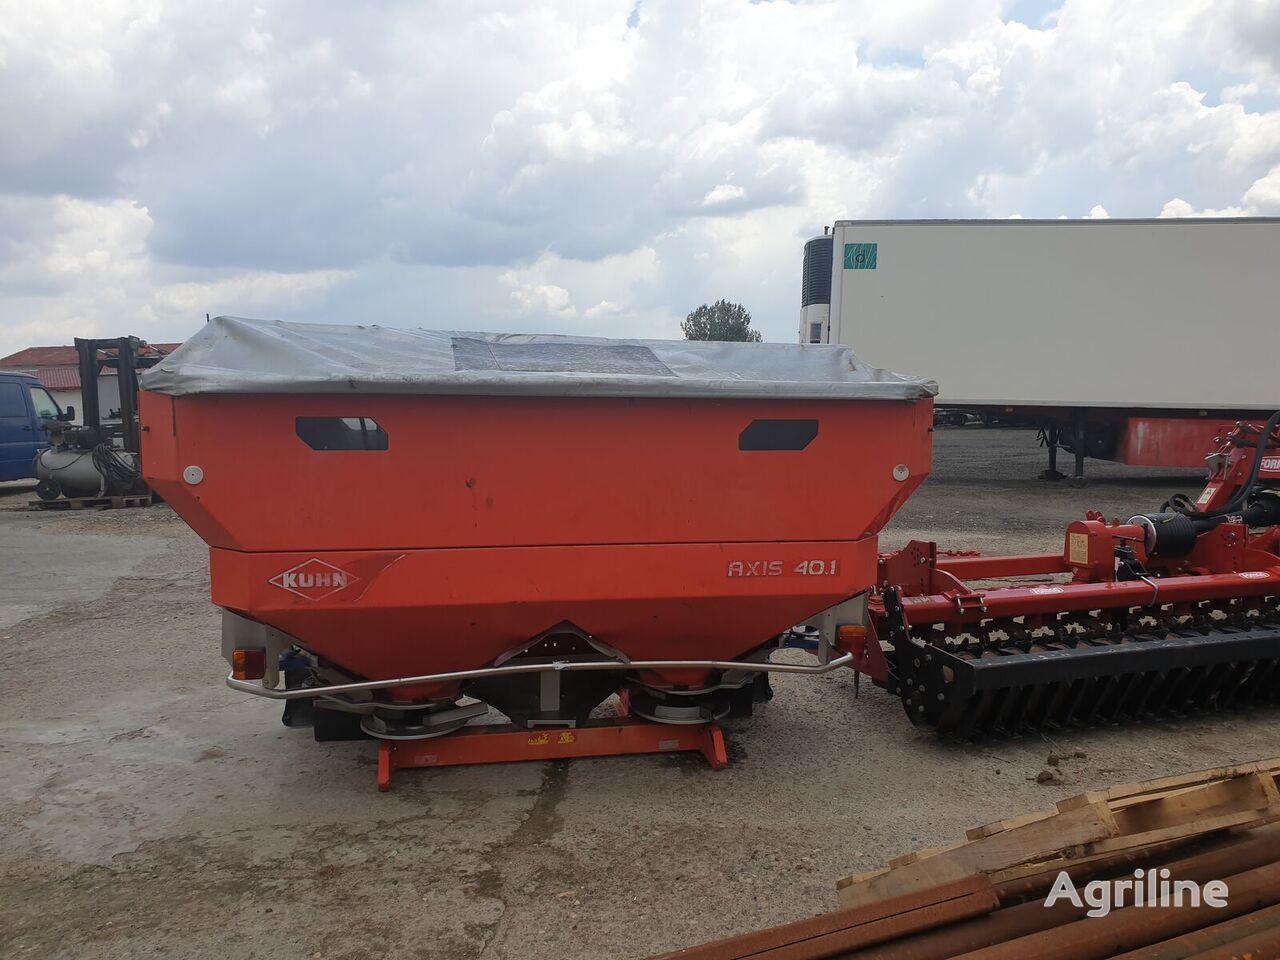 KUHN AXIS 40.1 mounted fertilizer spreader